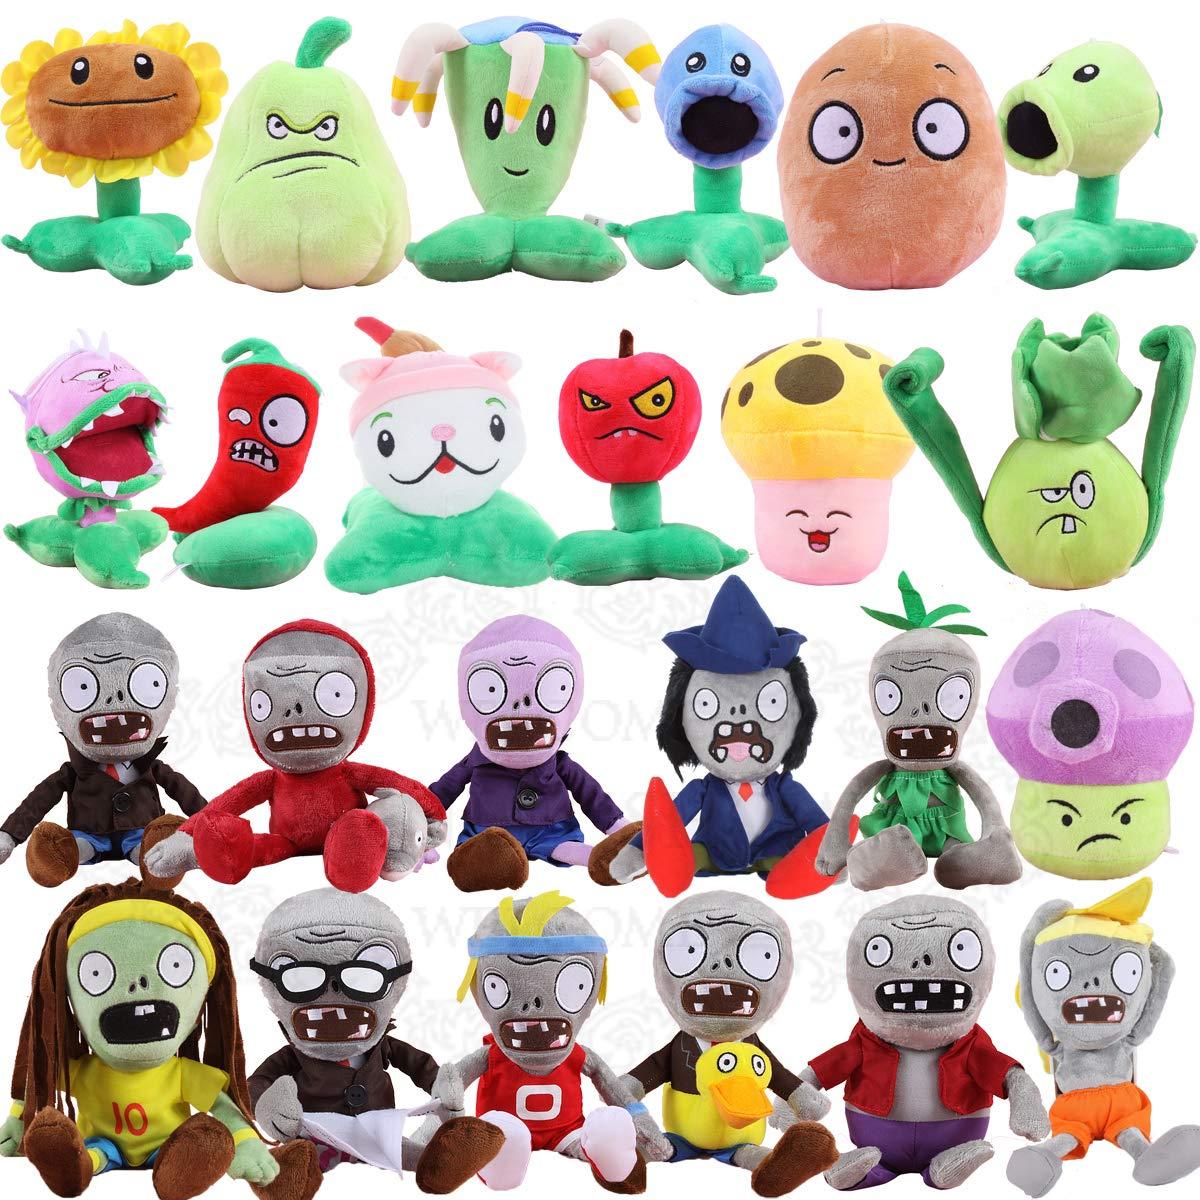 TavasDecor Plants vs Zombies 2 PVZ Figures Plush Toys Set (24pcs) Baby Staff Toy Stuffed Soft Doll Lot 15-20cm/6-8'' Tall by TavasDecor